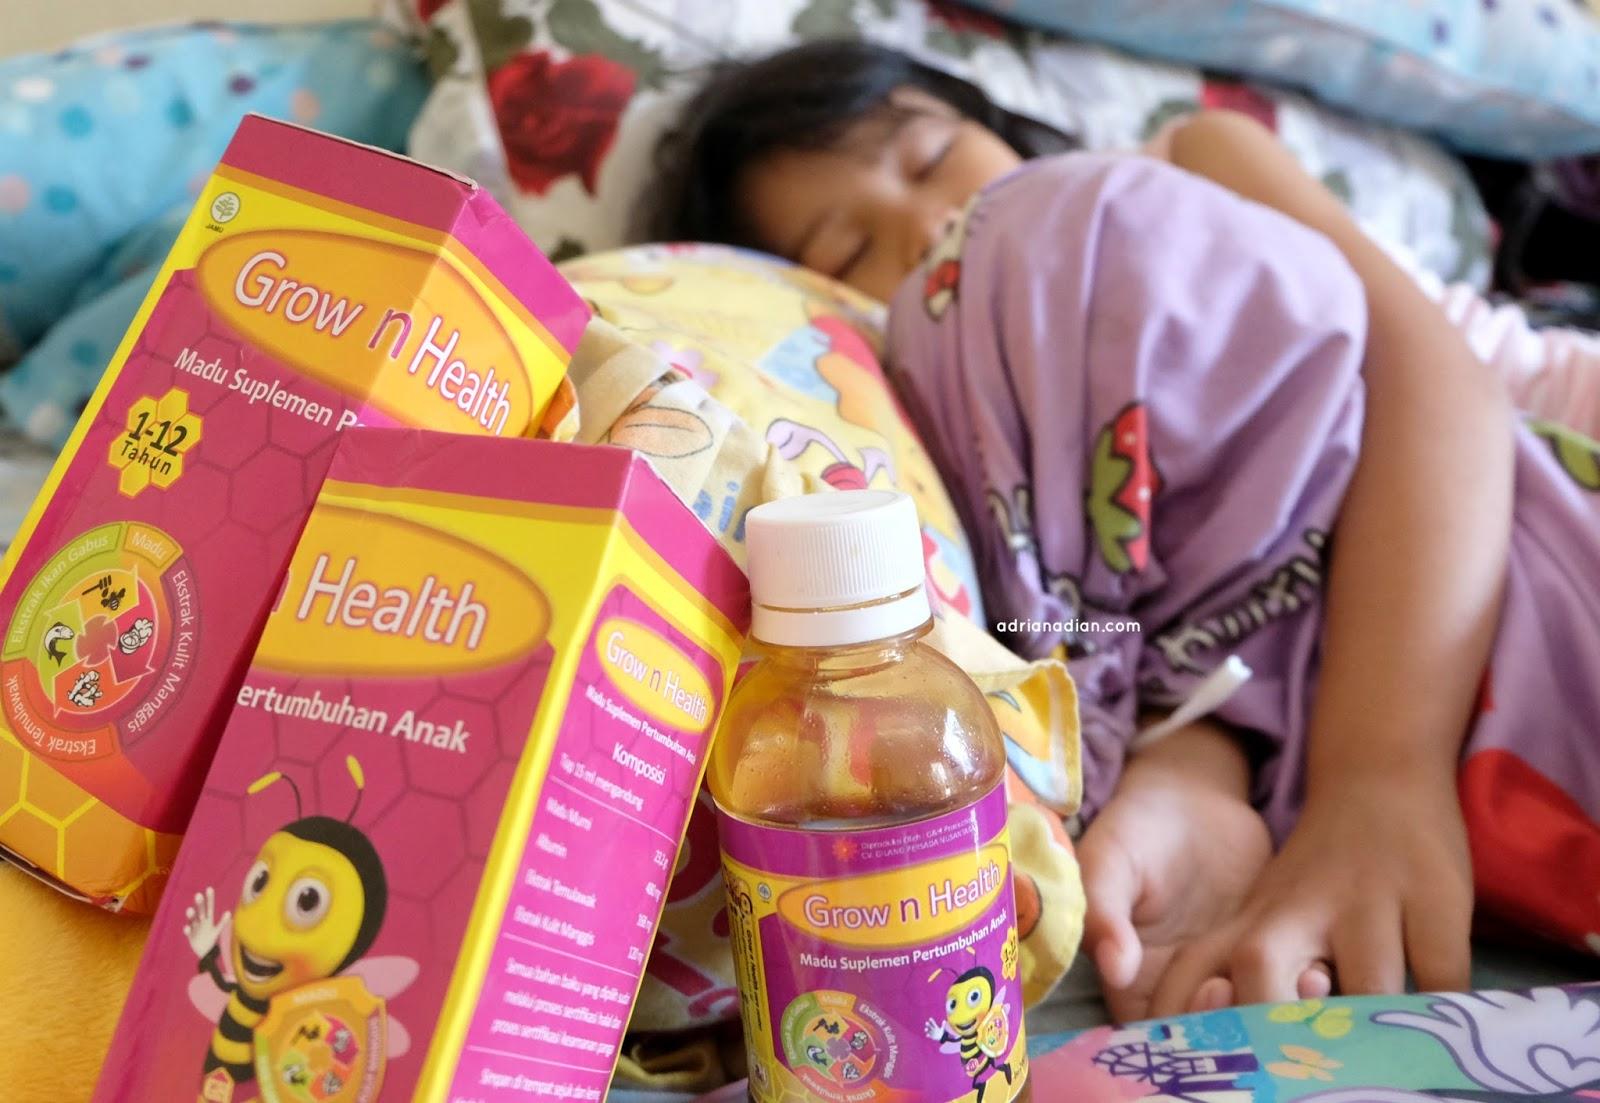 Madu Suplemen Pertumbuhan Anak Grow n Health